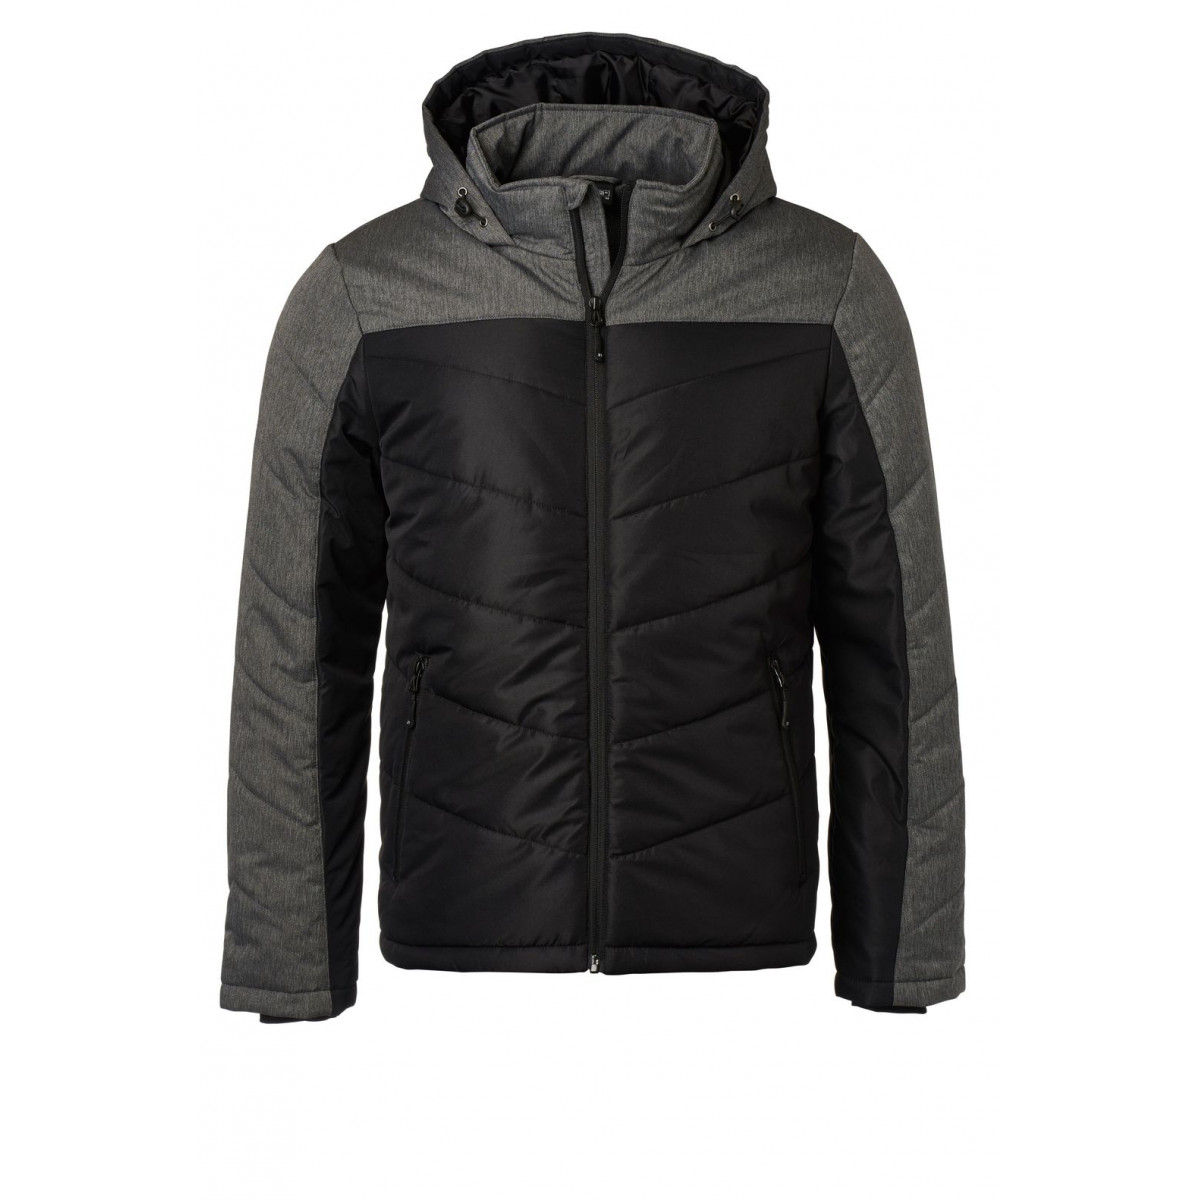 Куртка мужская JN1134 Mens Winter Jacket - Черный/Темно-серый меланж